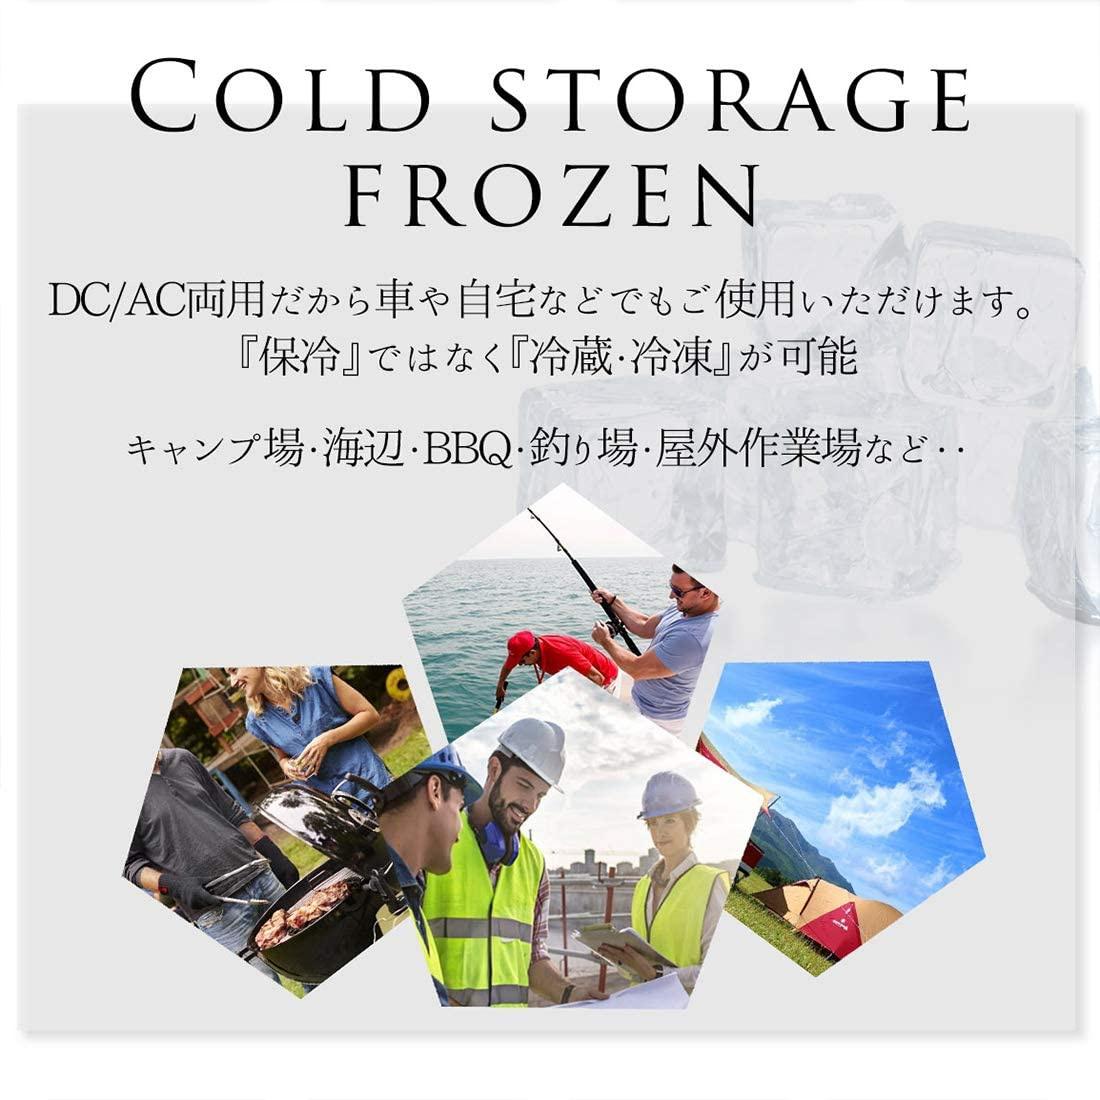 NSS(エヌエスエス) 車載用 冷蔵冷凍庫 STL-C20の商品画像3